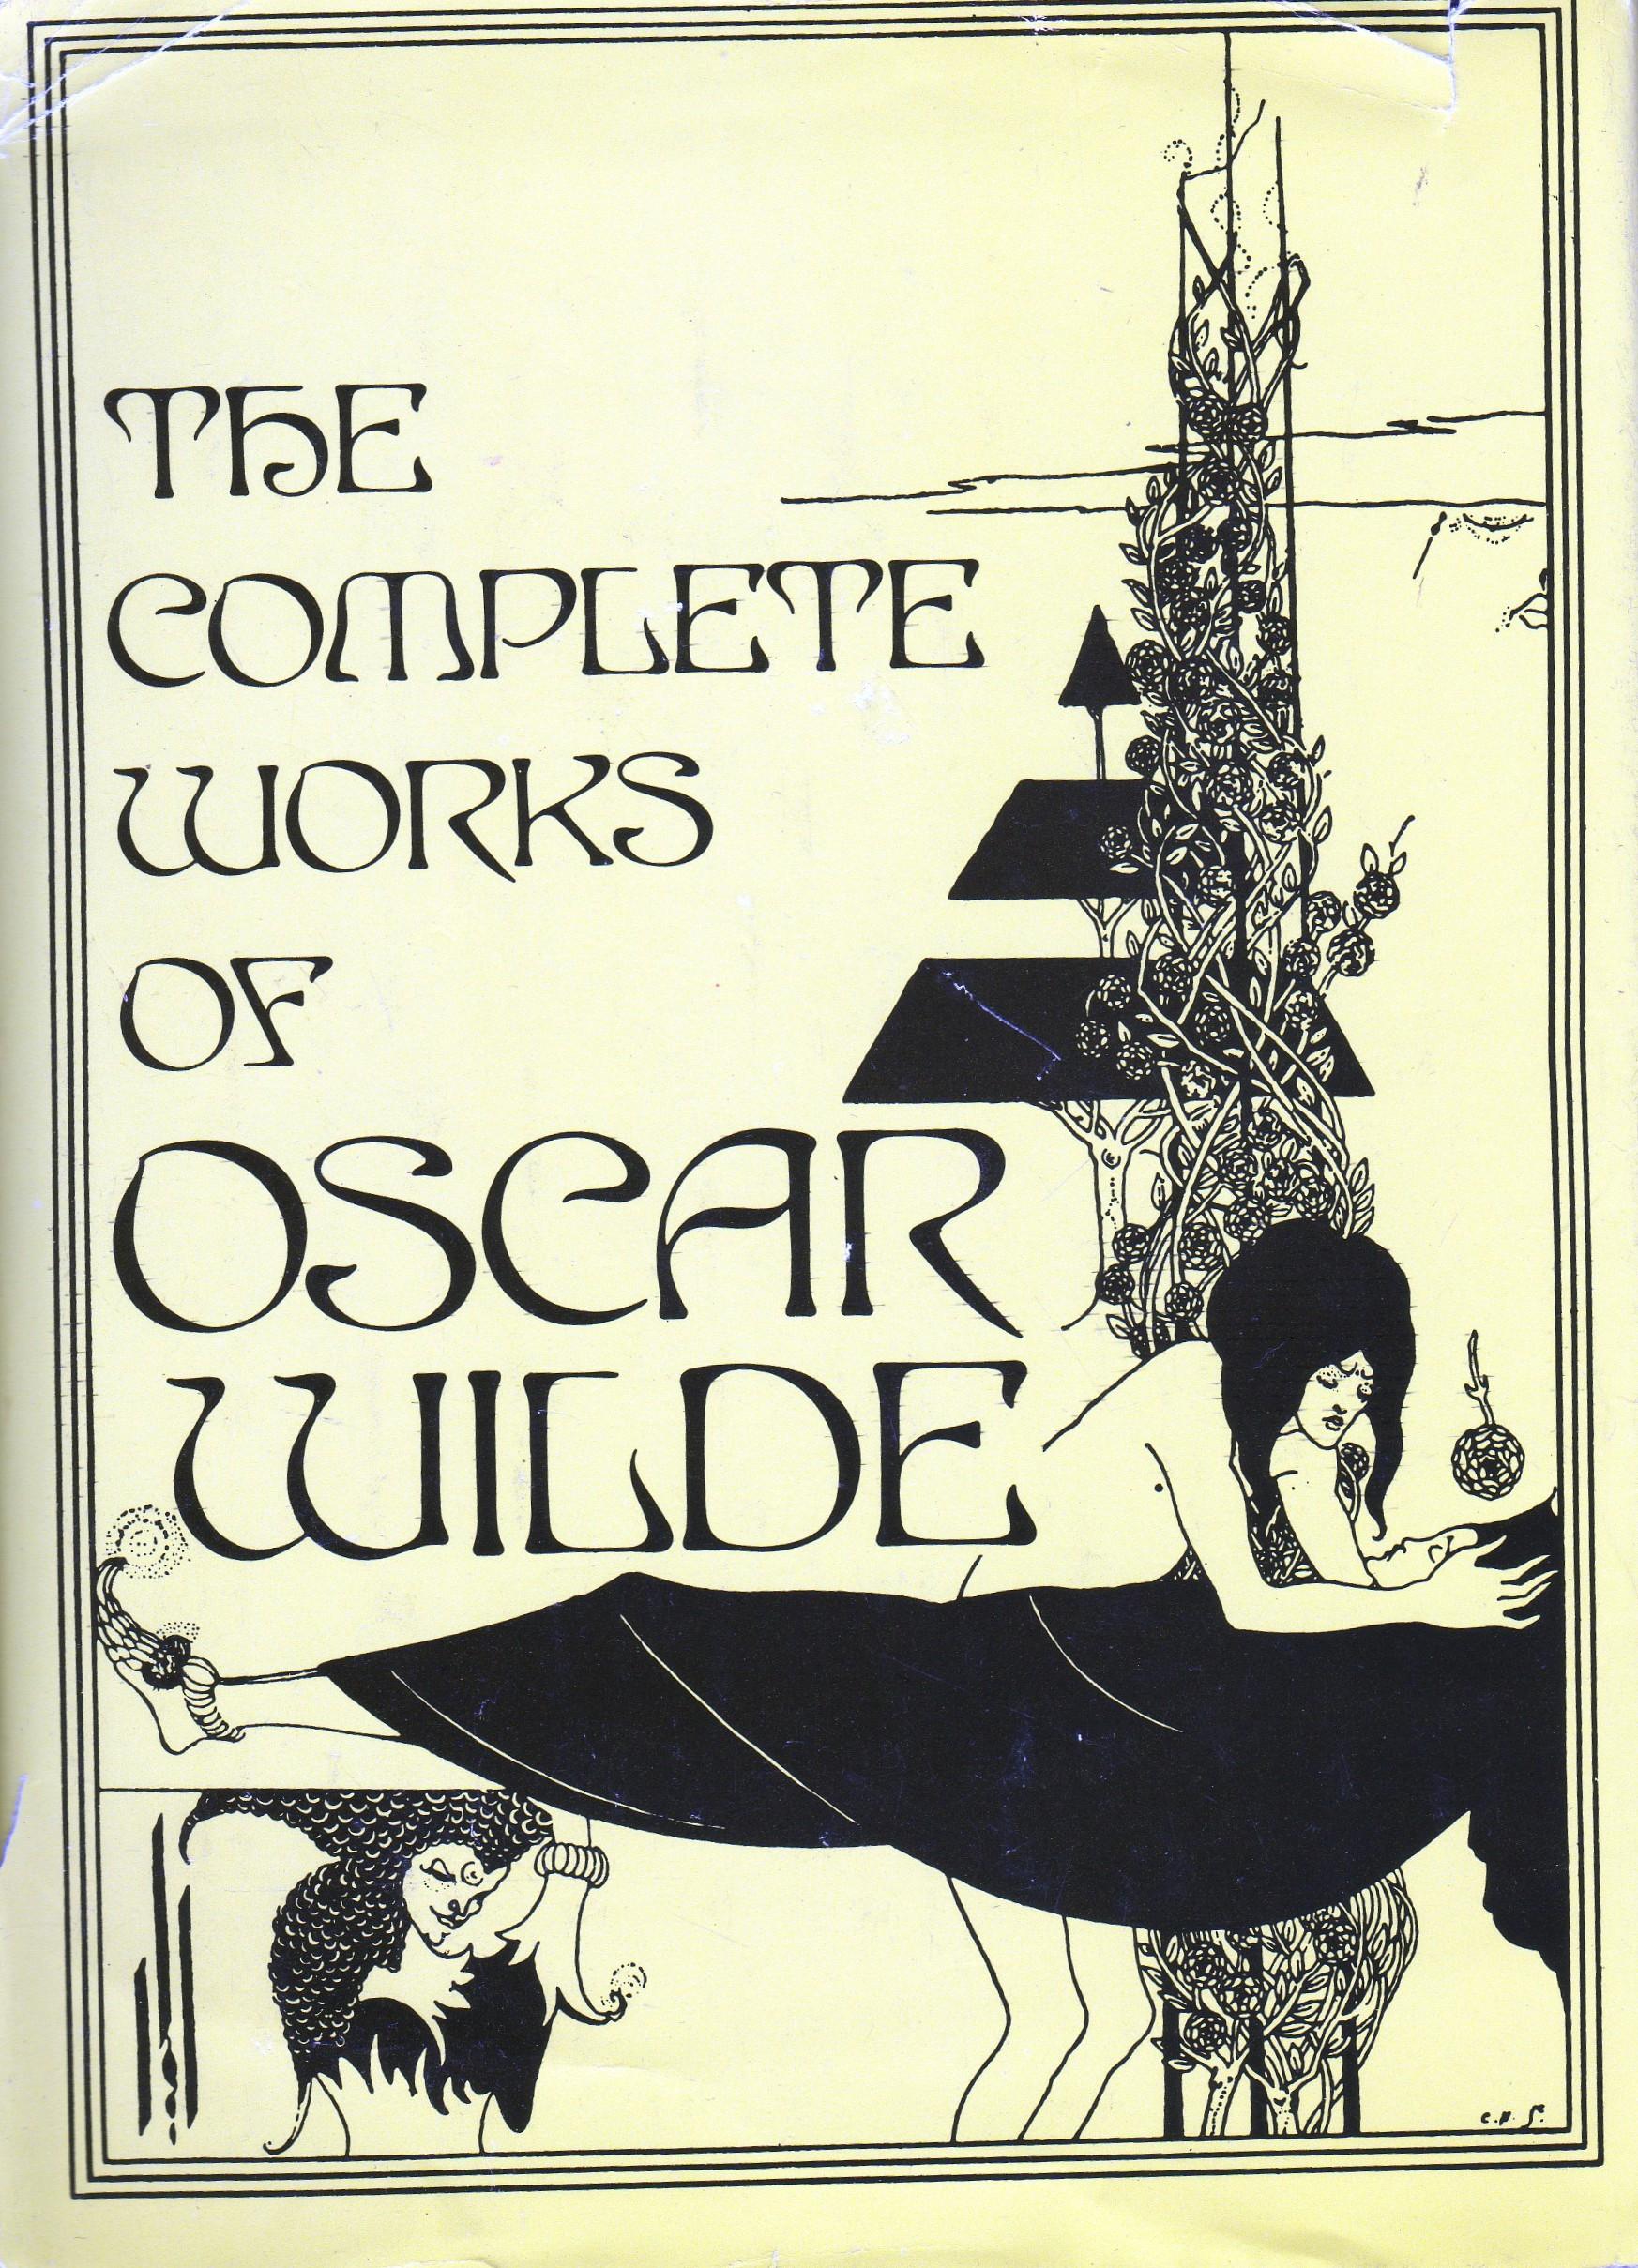 The Works of Oscar Wilde